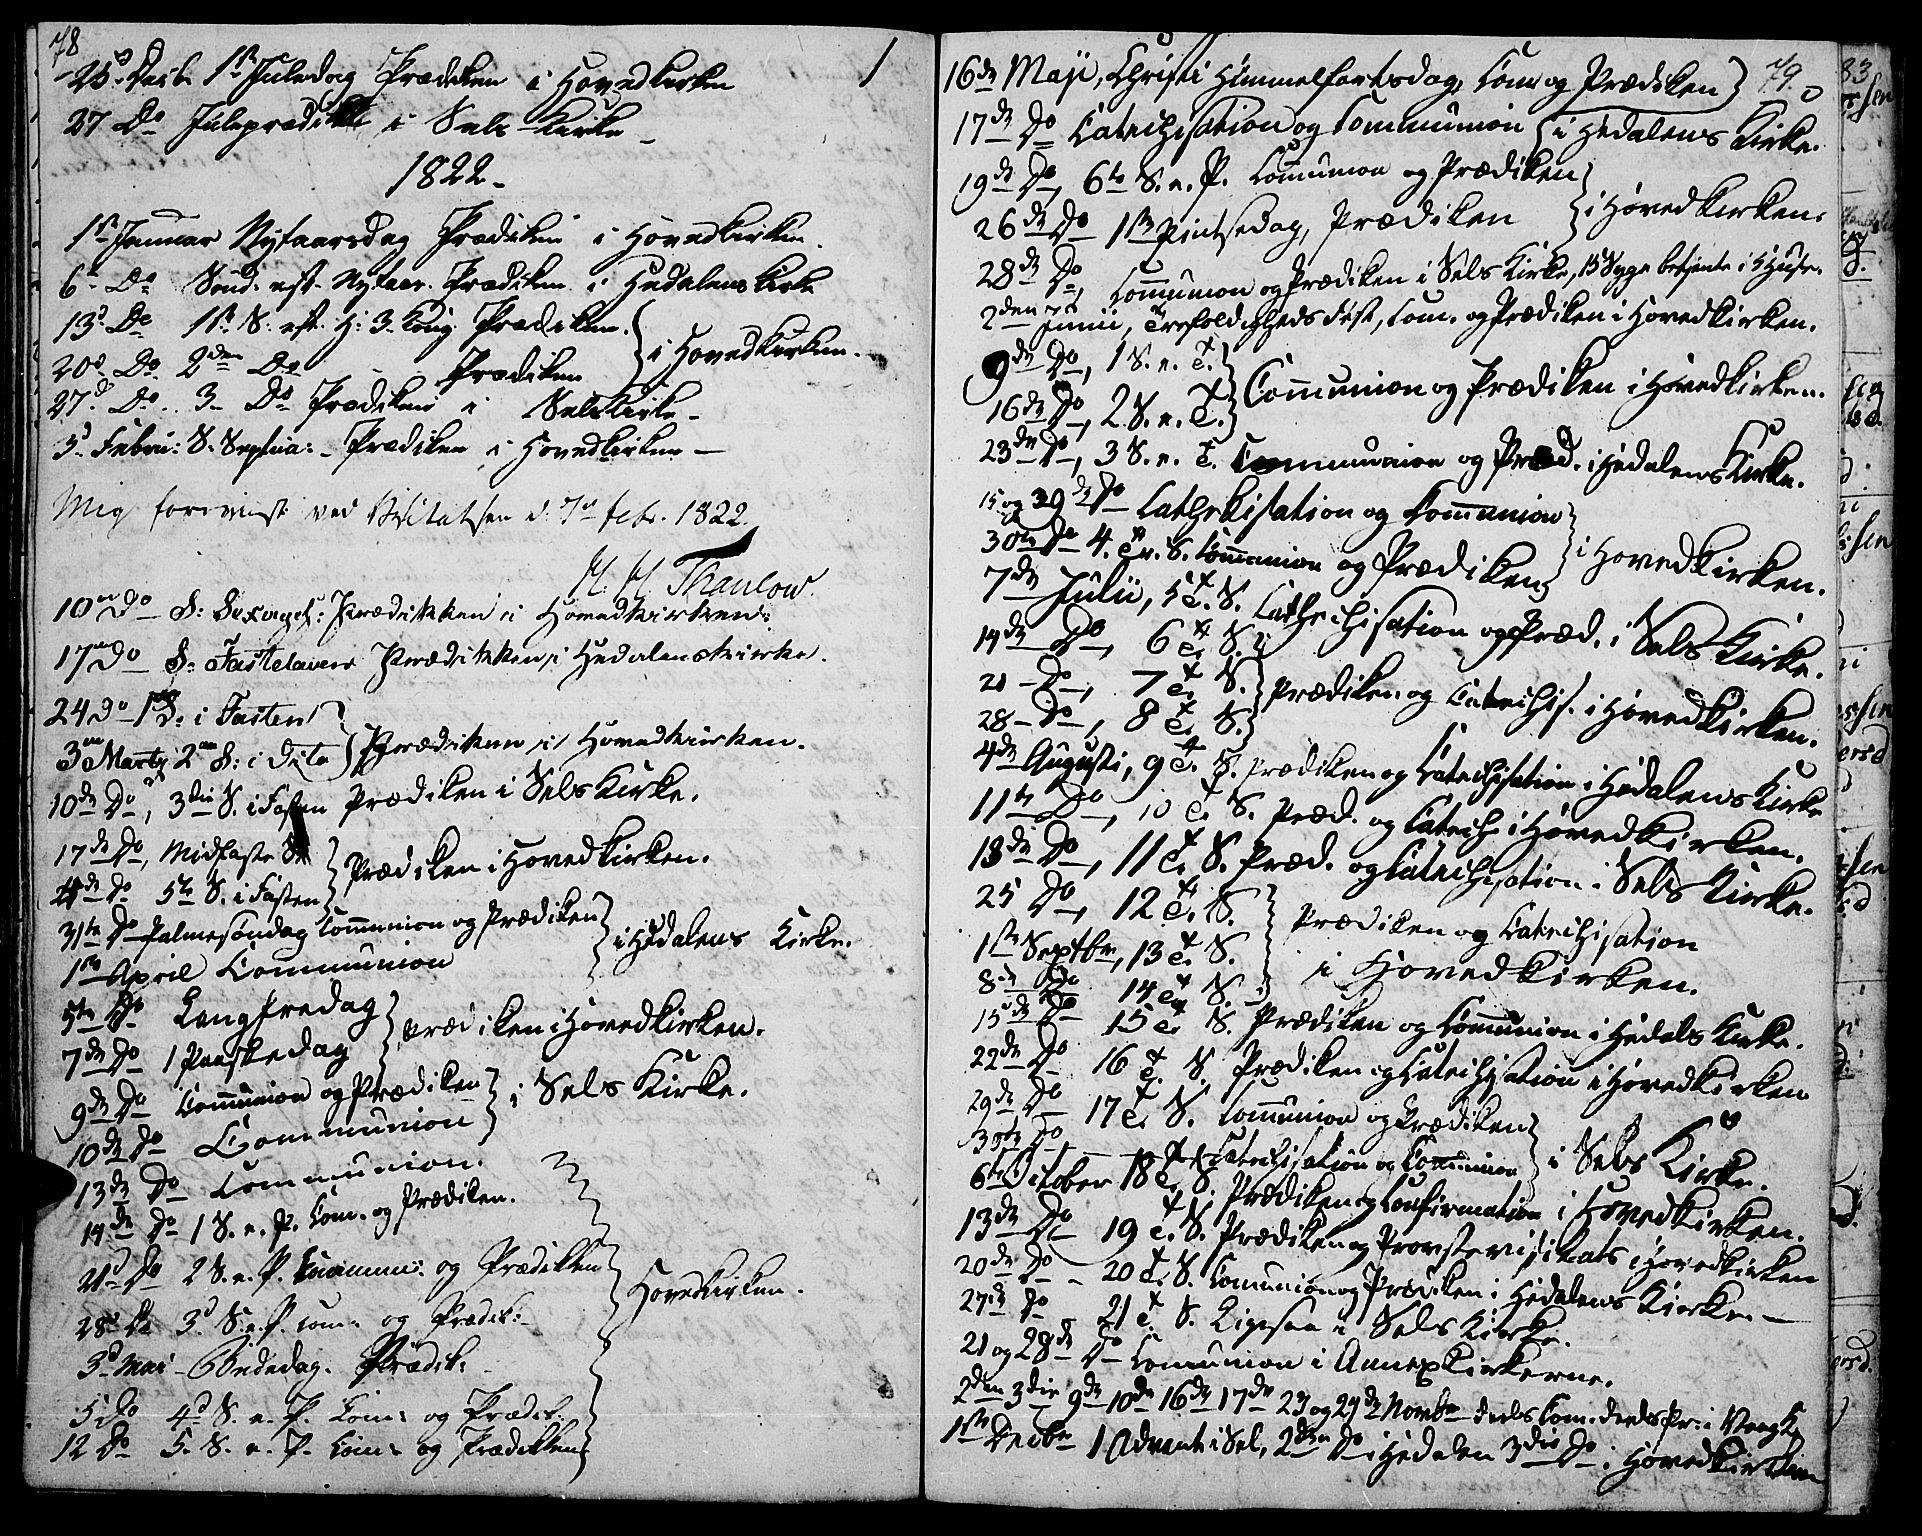 SAH, Vågå prestekontor, Ministerialbok nr. 2, 1810-1815, s. 78-79